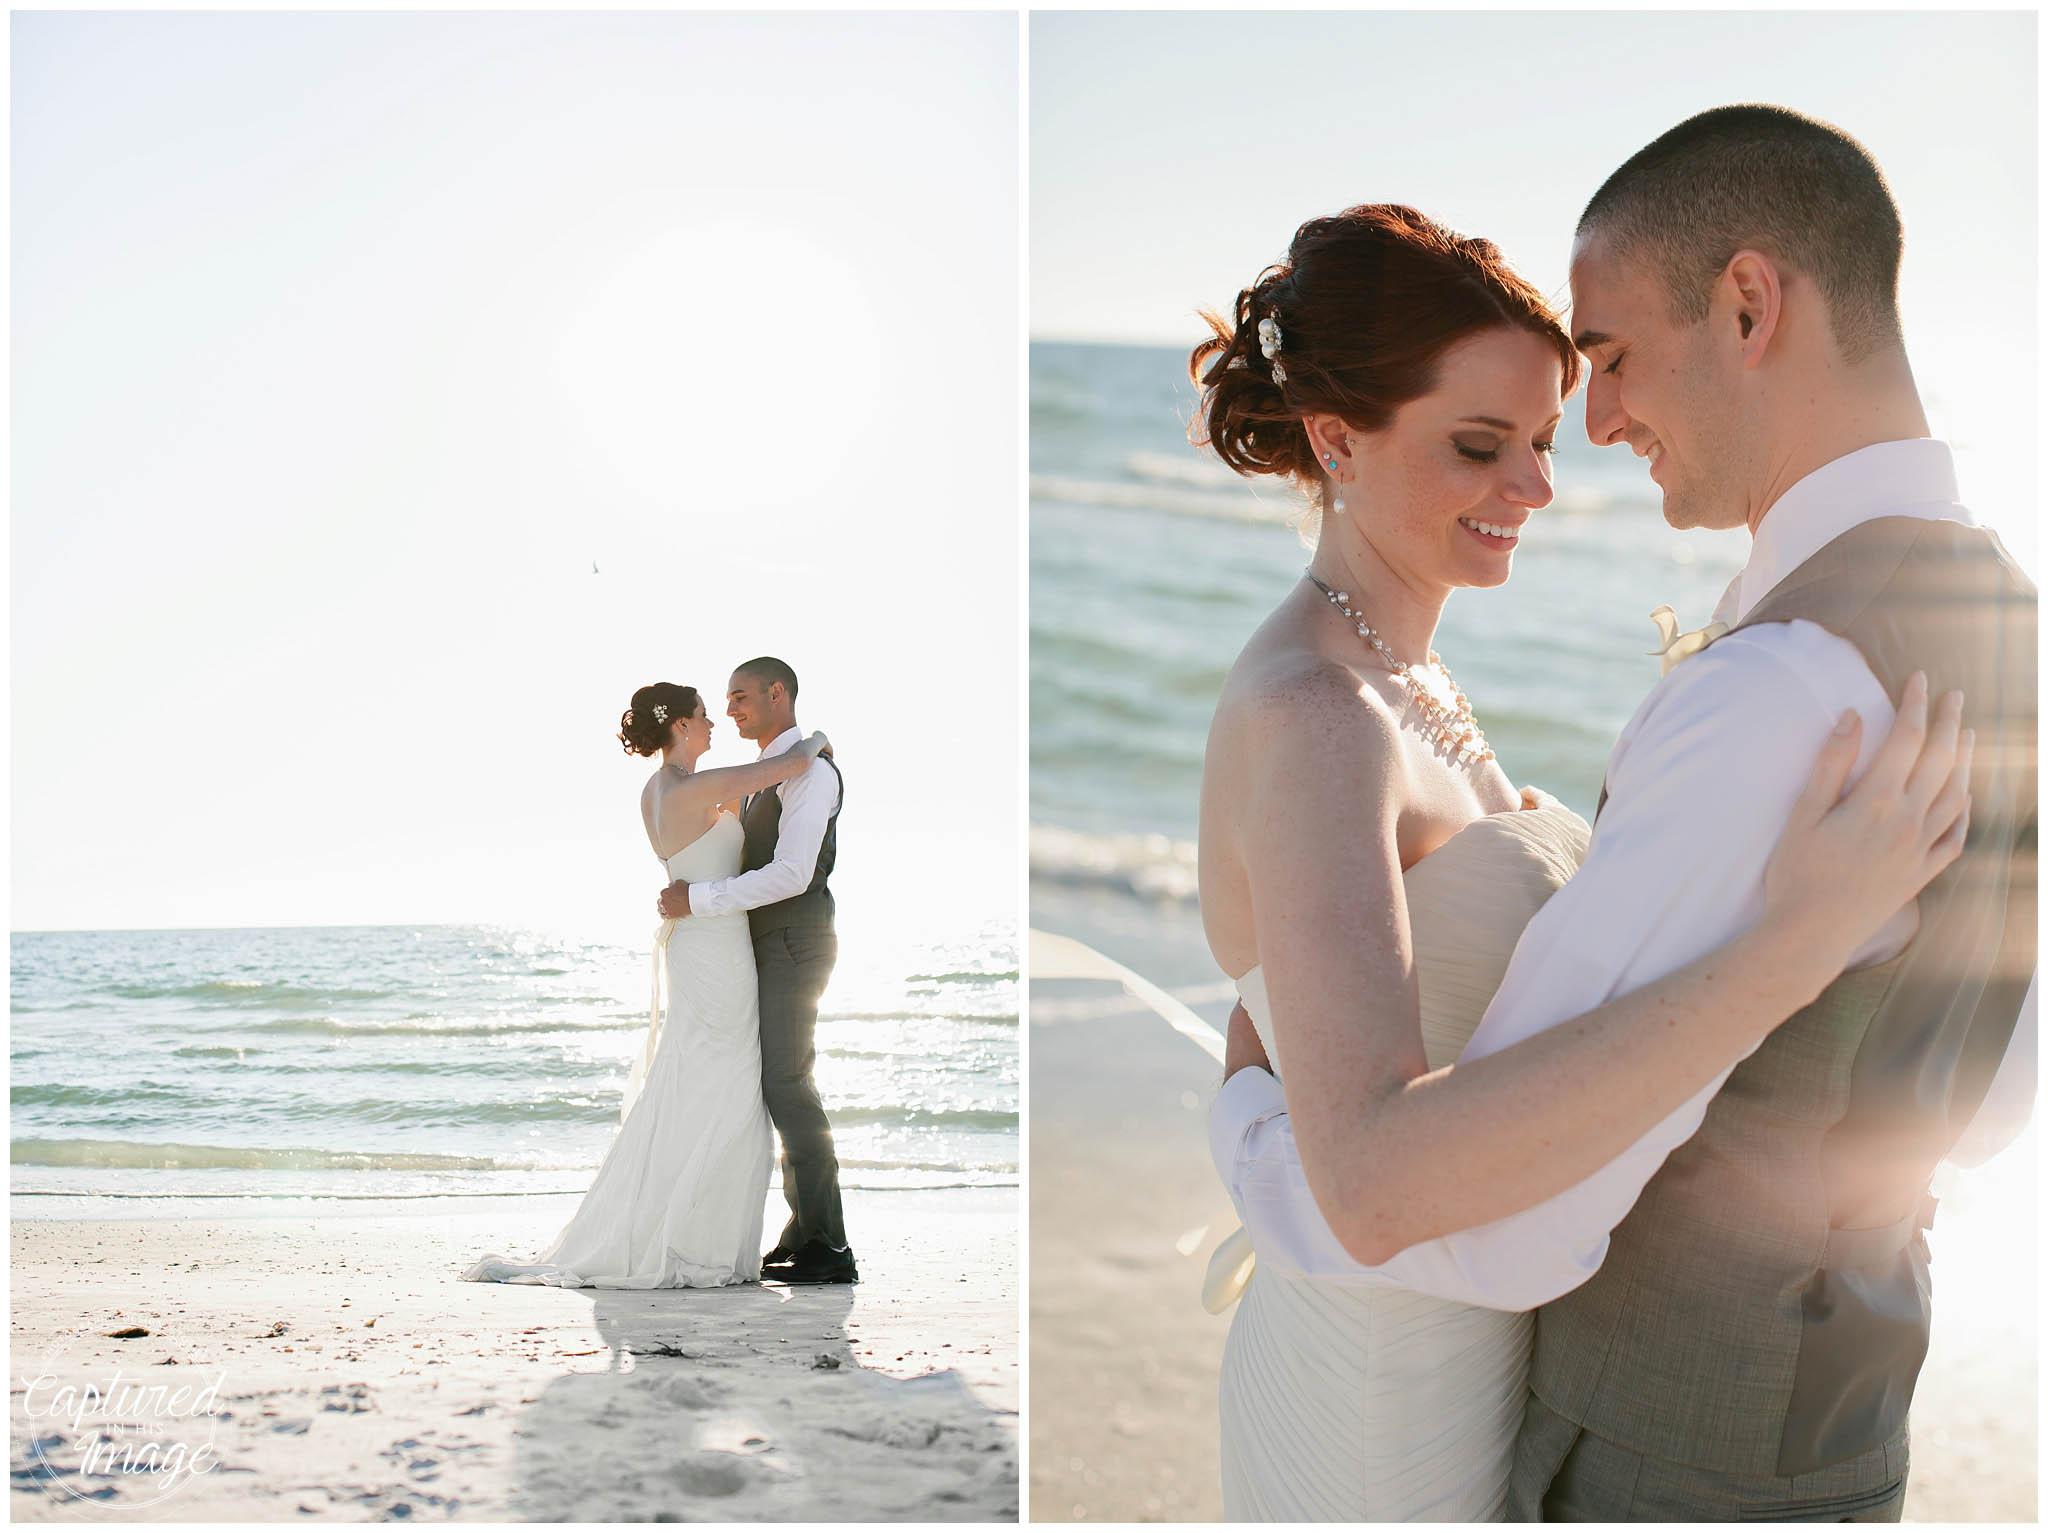 St. Pete Beach Destination Wedding (23 of 81)